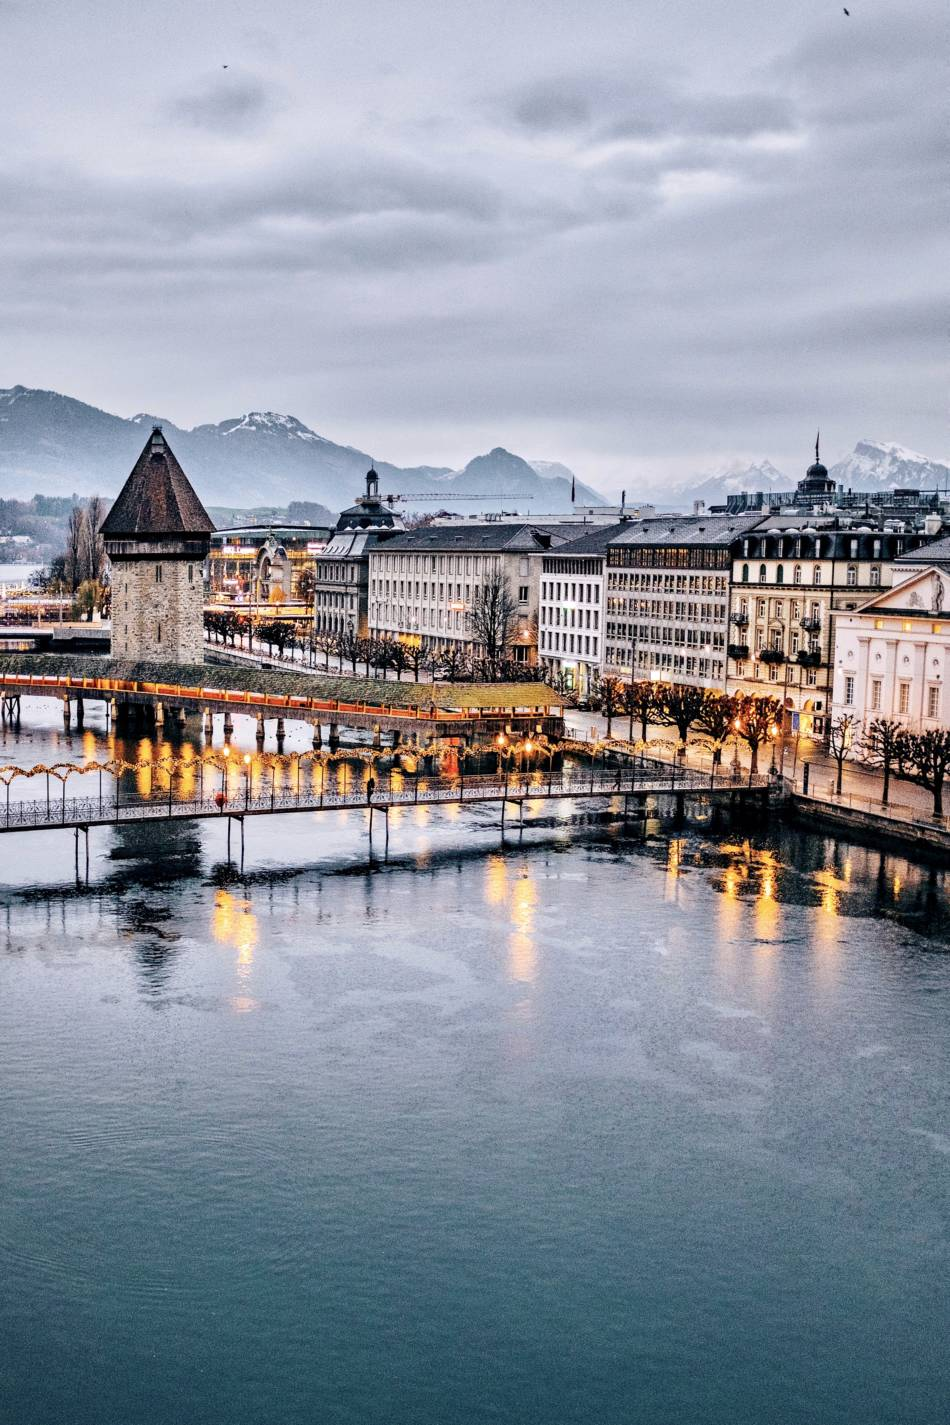 Ponte della cappella - Lucerna